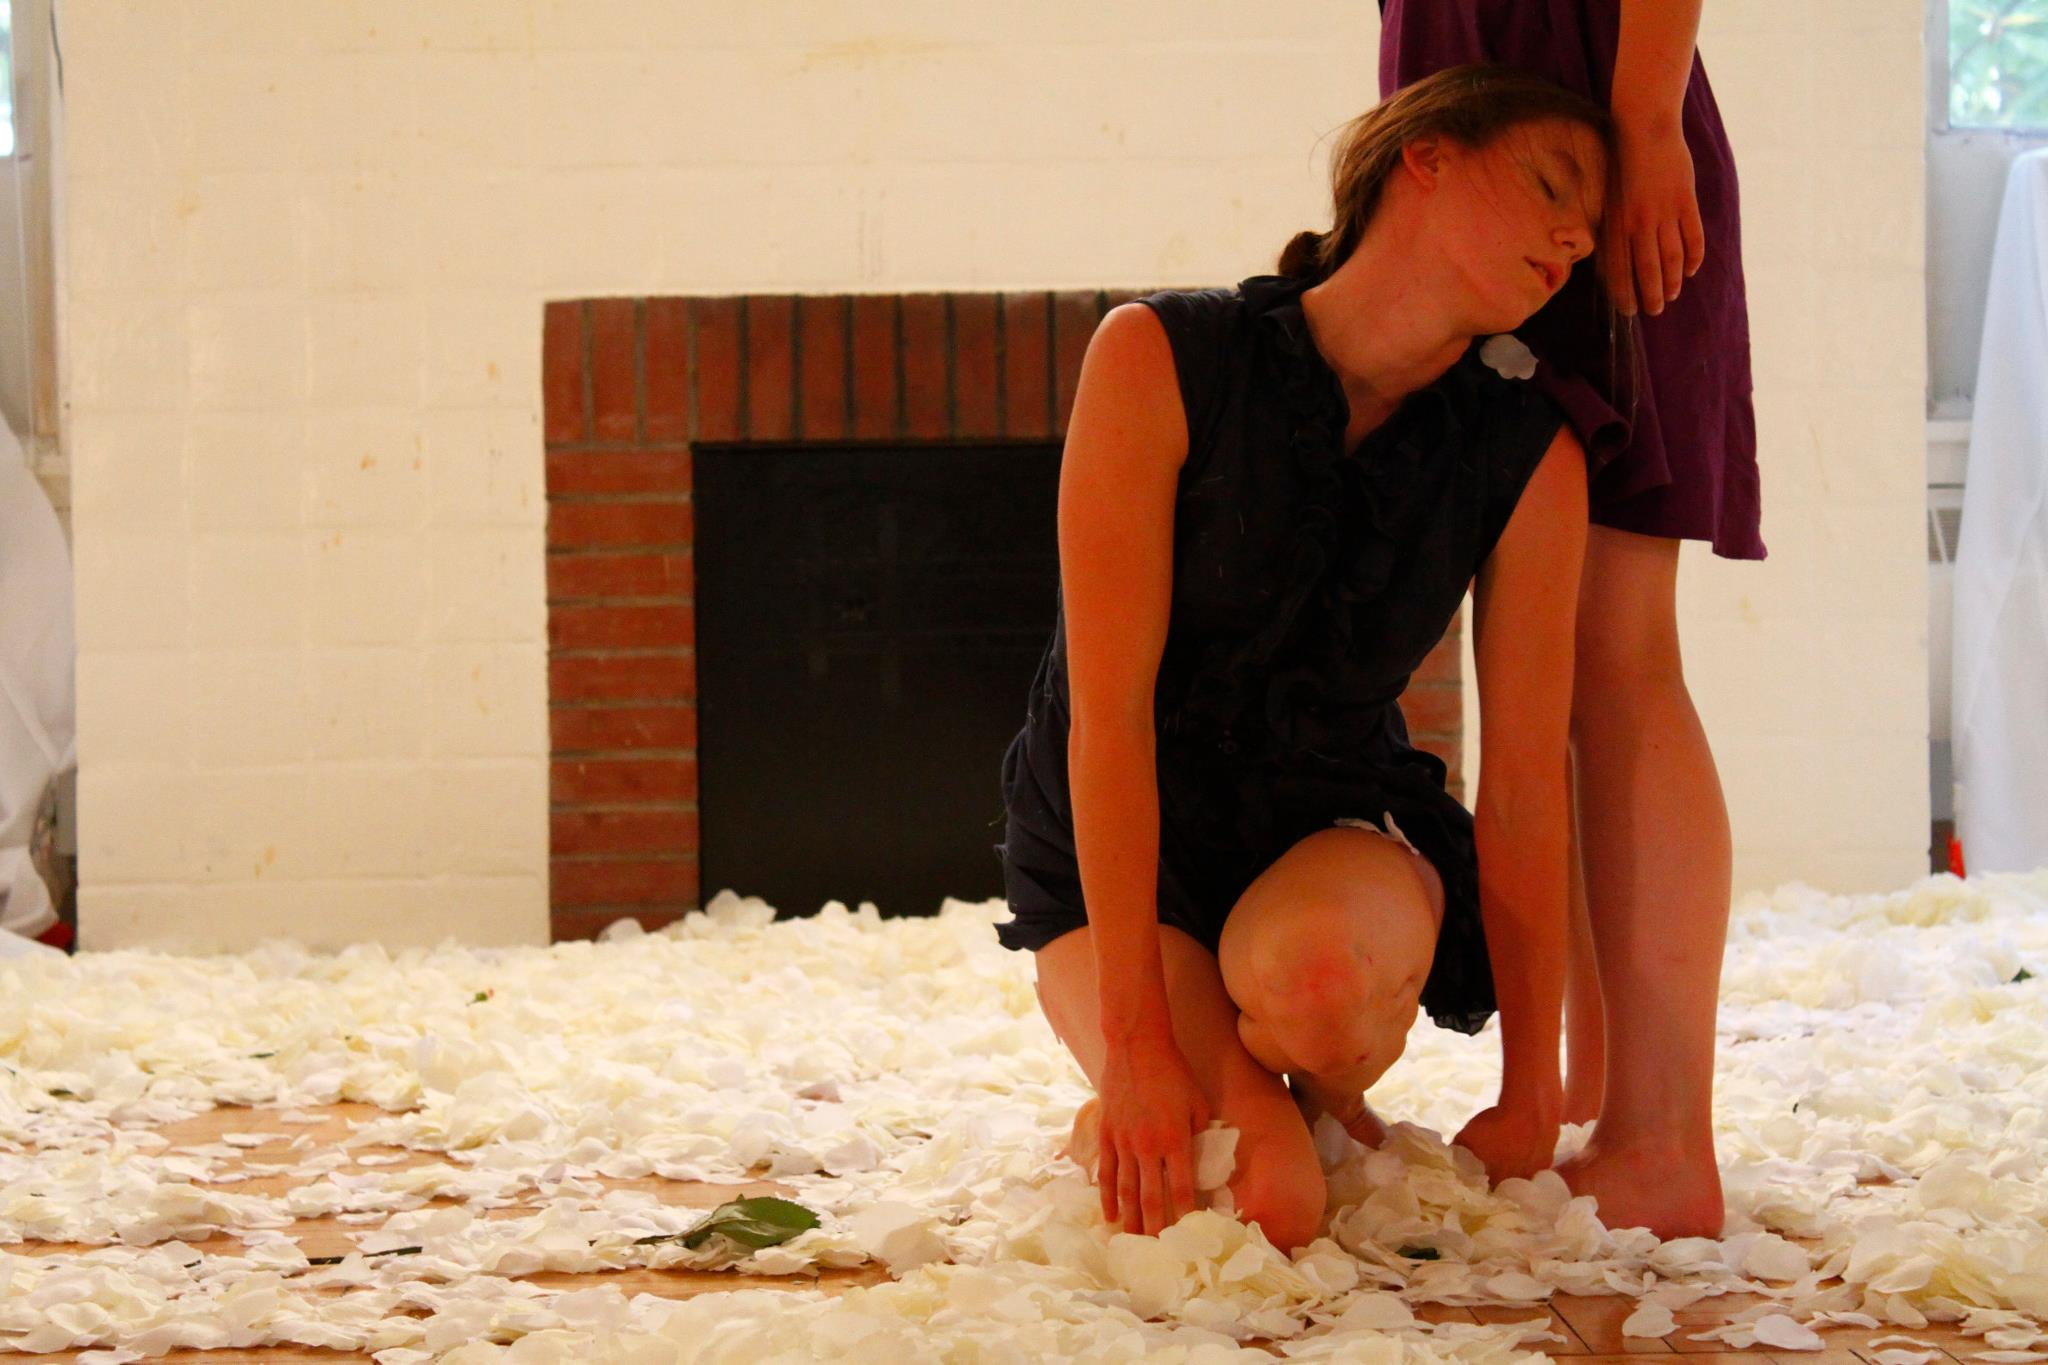 That one should open 013_Dancers Janice Lancaster Larsen & Lauren Muraski, photographer Wong Chun Bong, ADF 2011.jpg